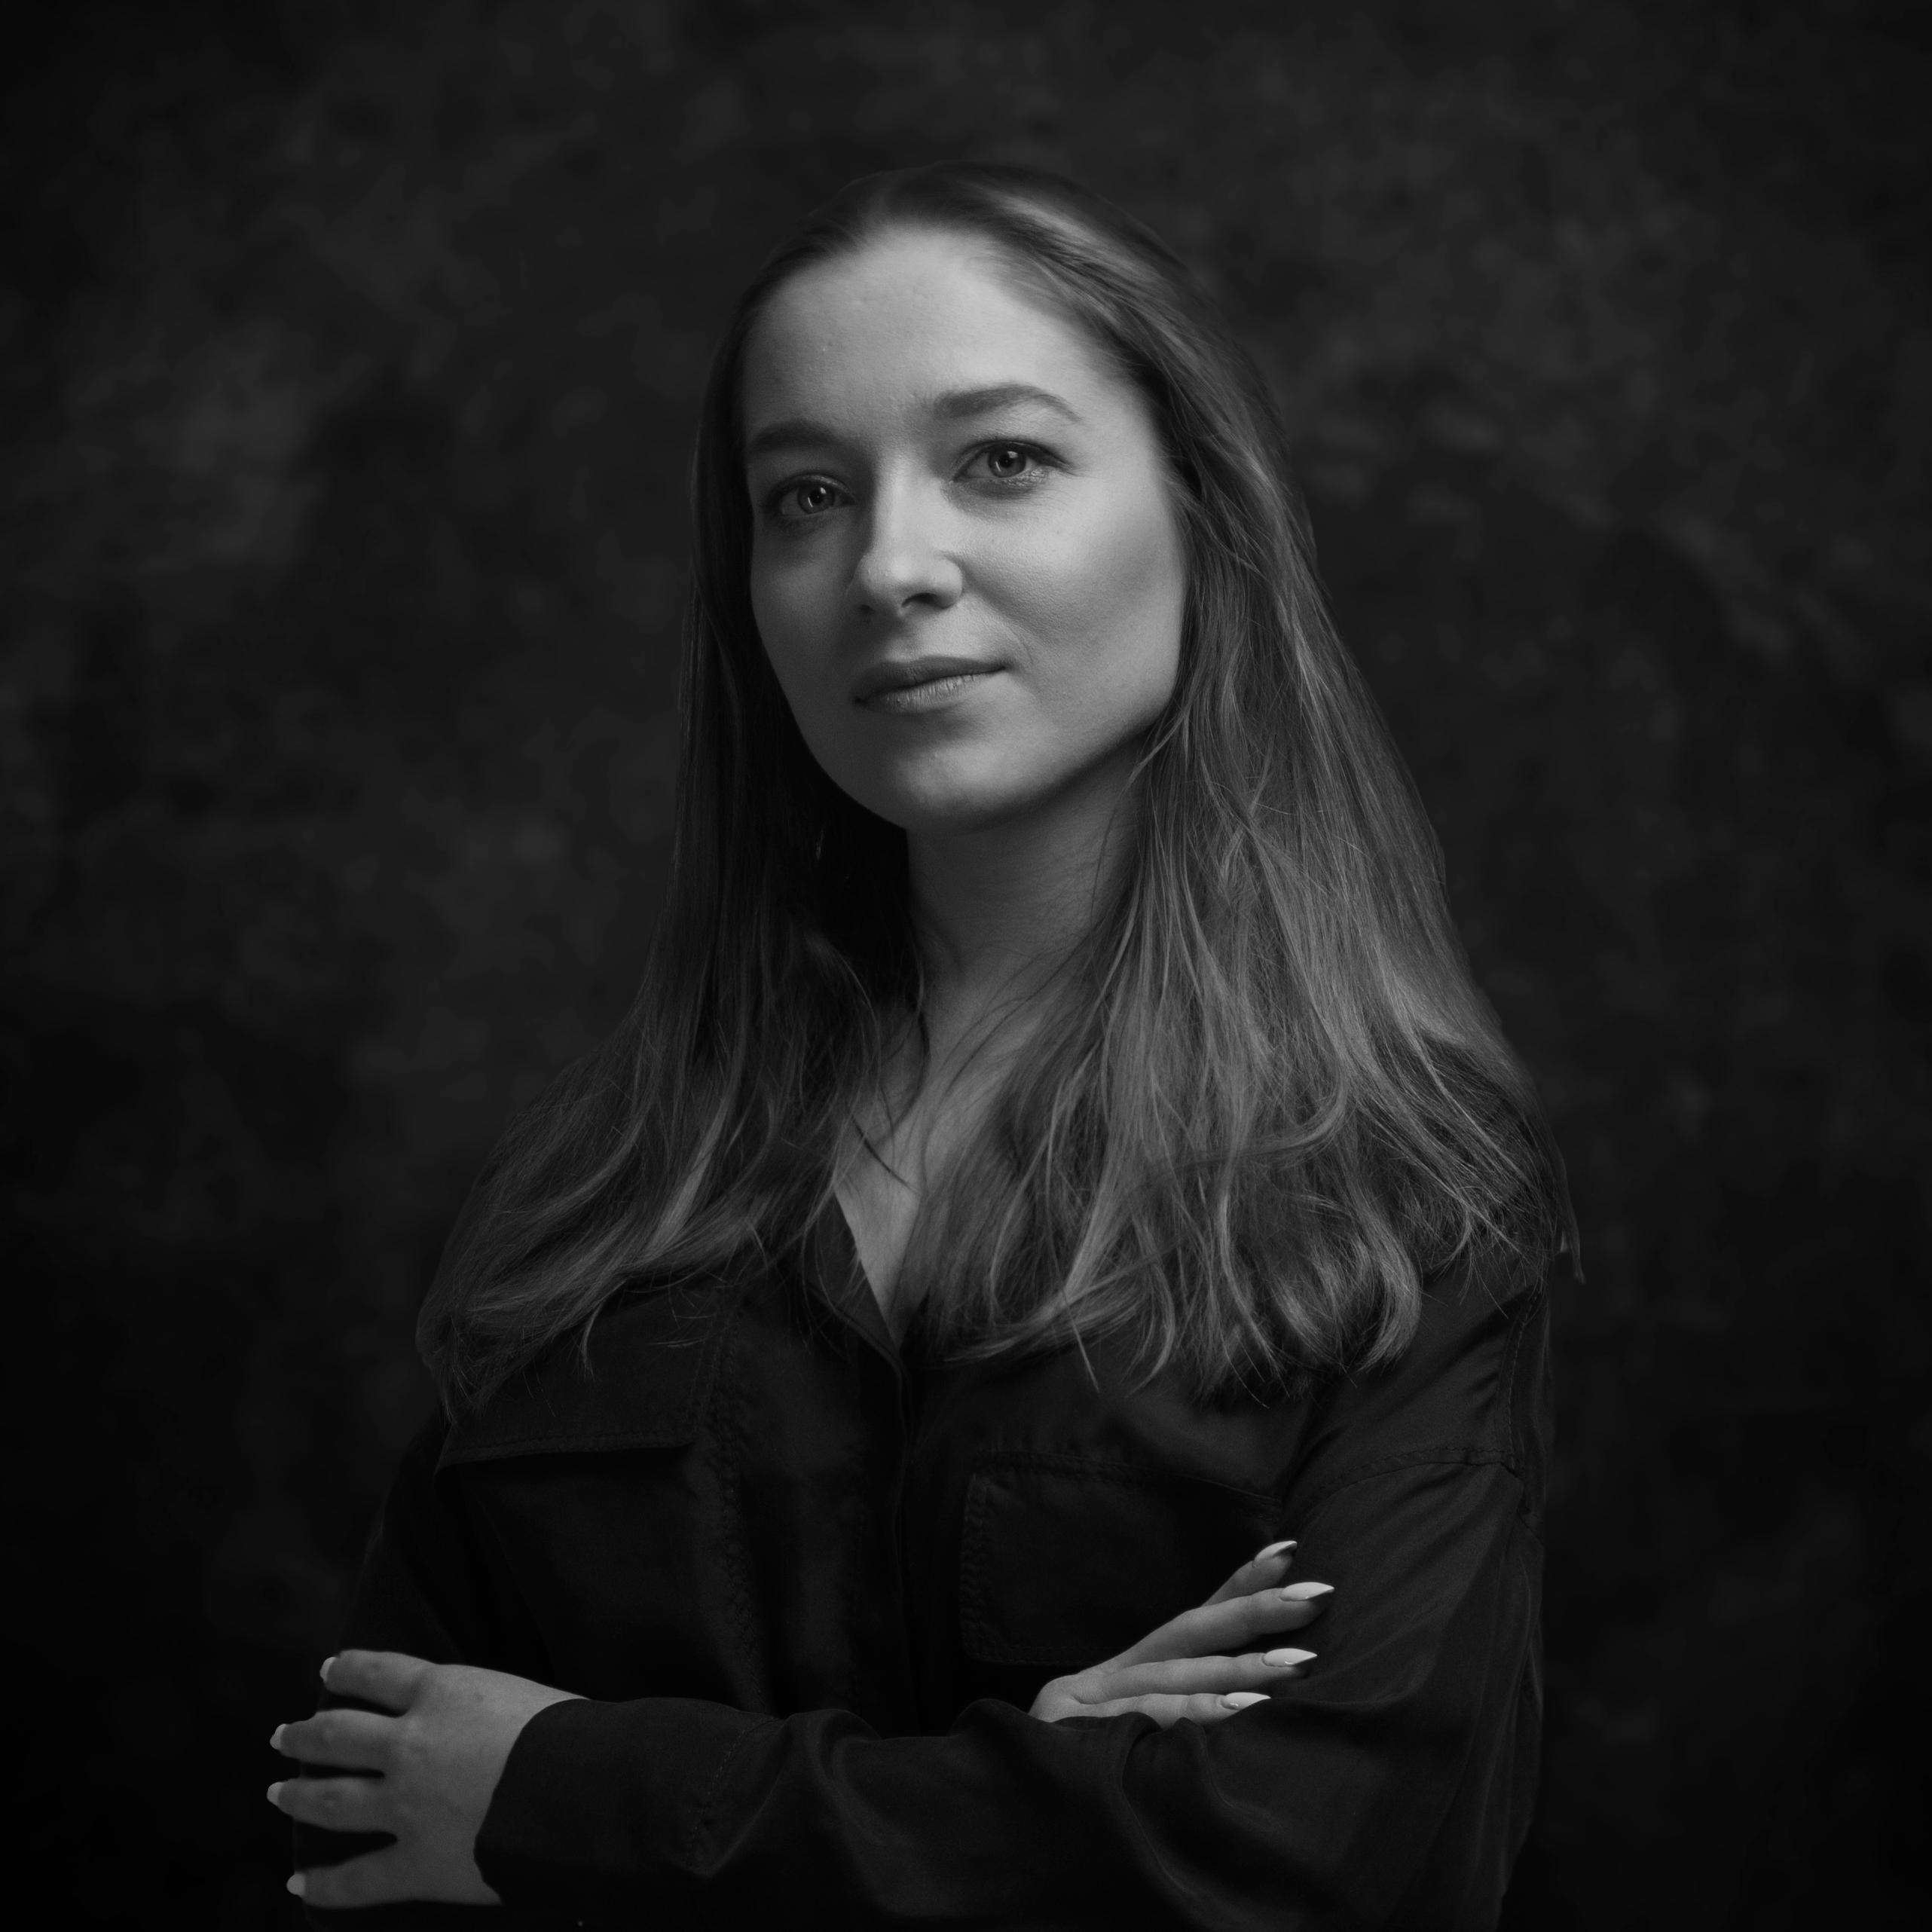 Natalia Starzyk